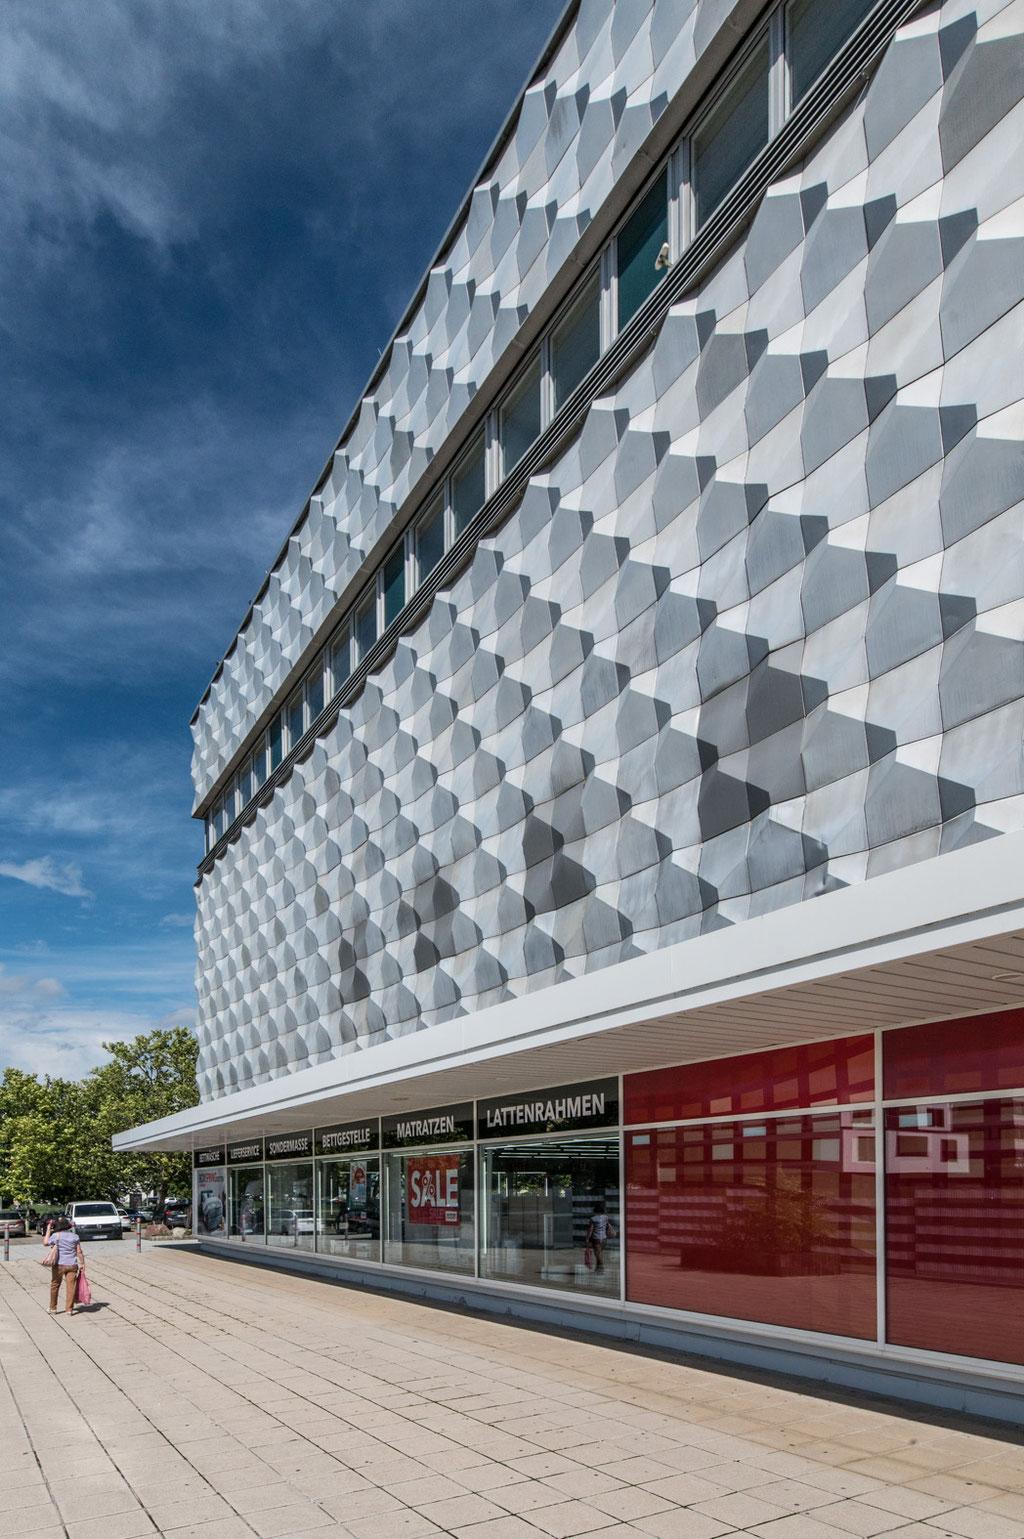 Centrum-Warenhaus (G. Walter, H. Fellmann), Hoyerswerda (D)